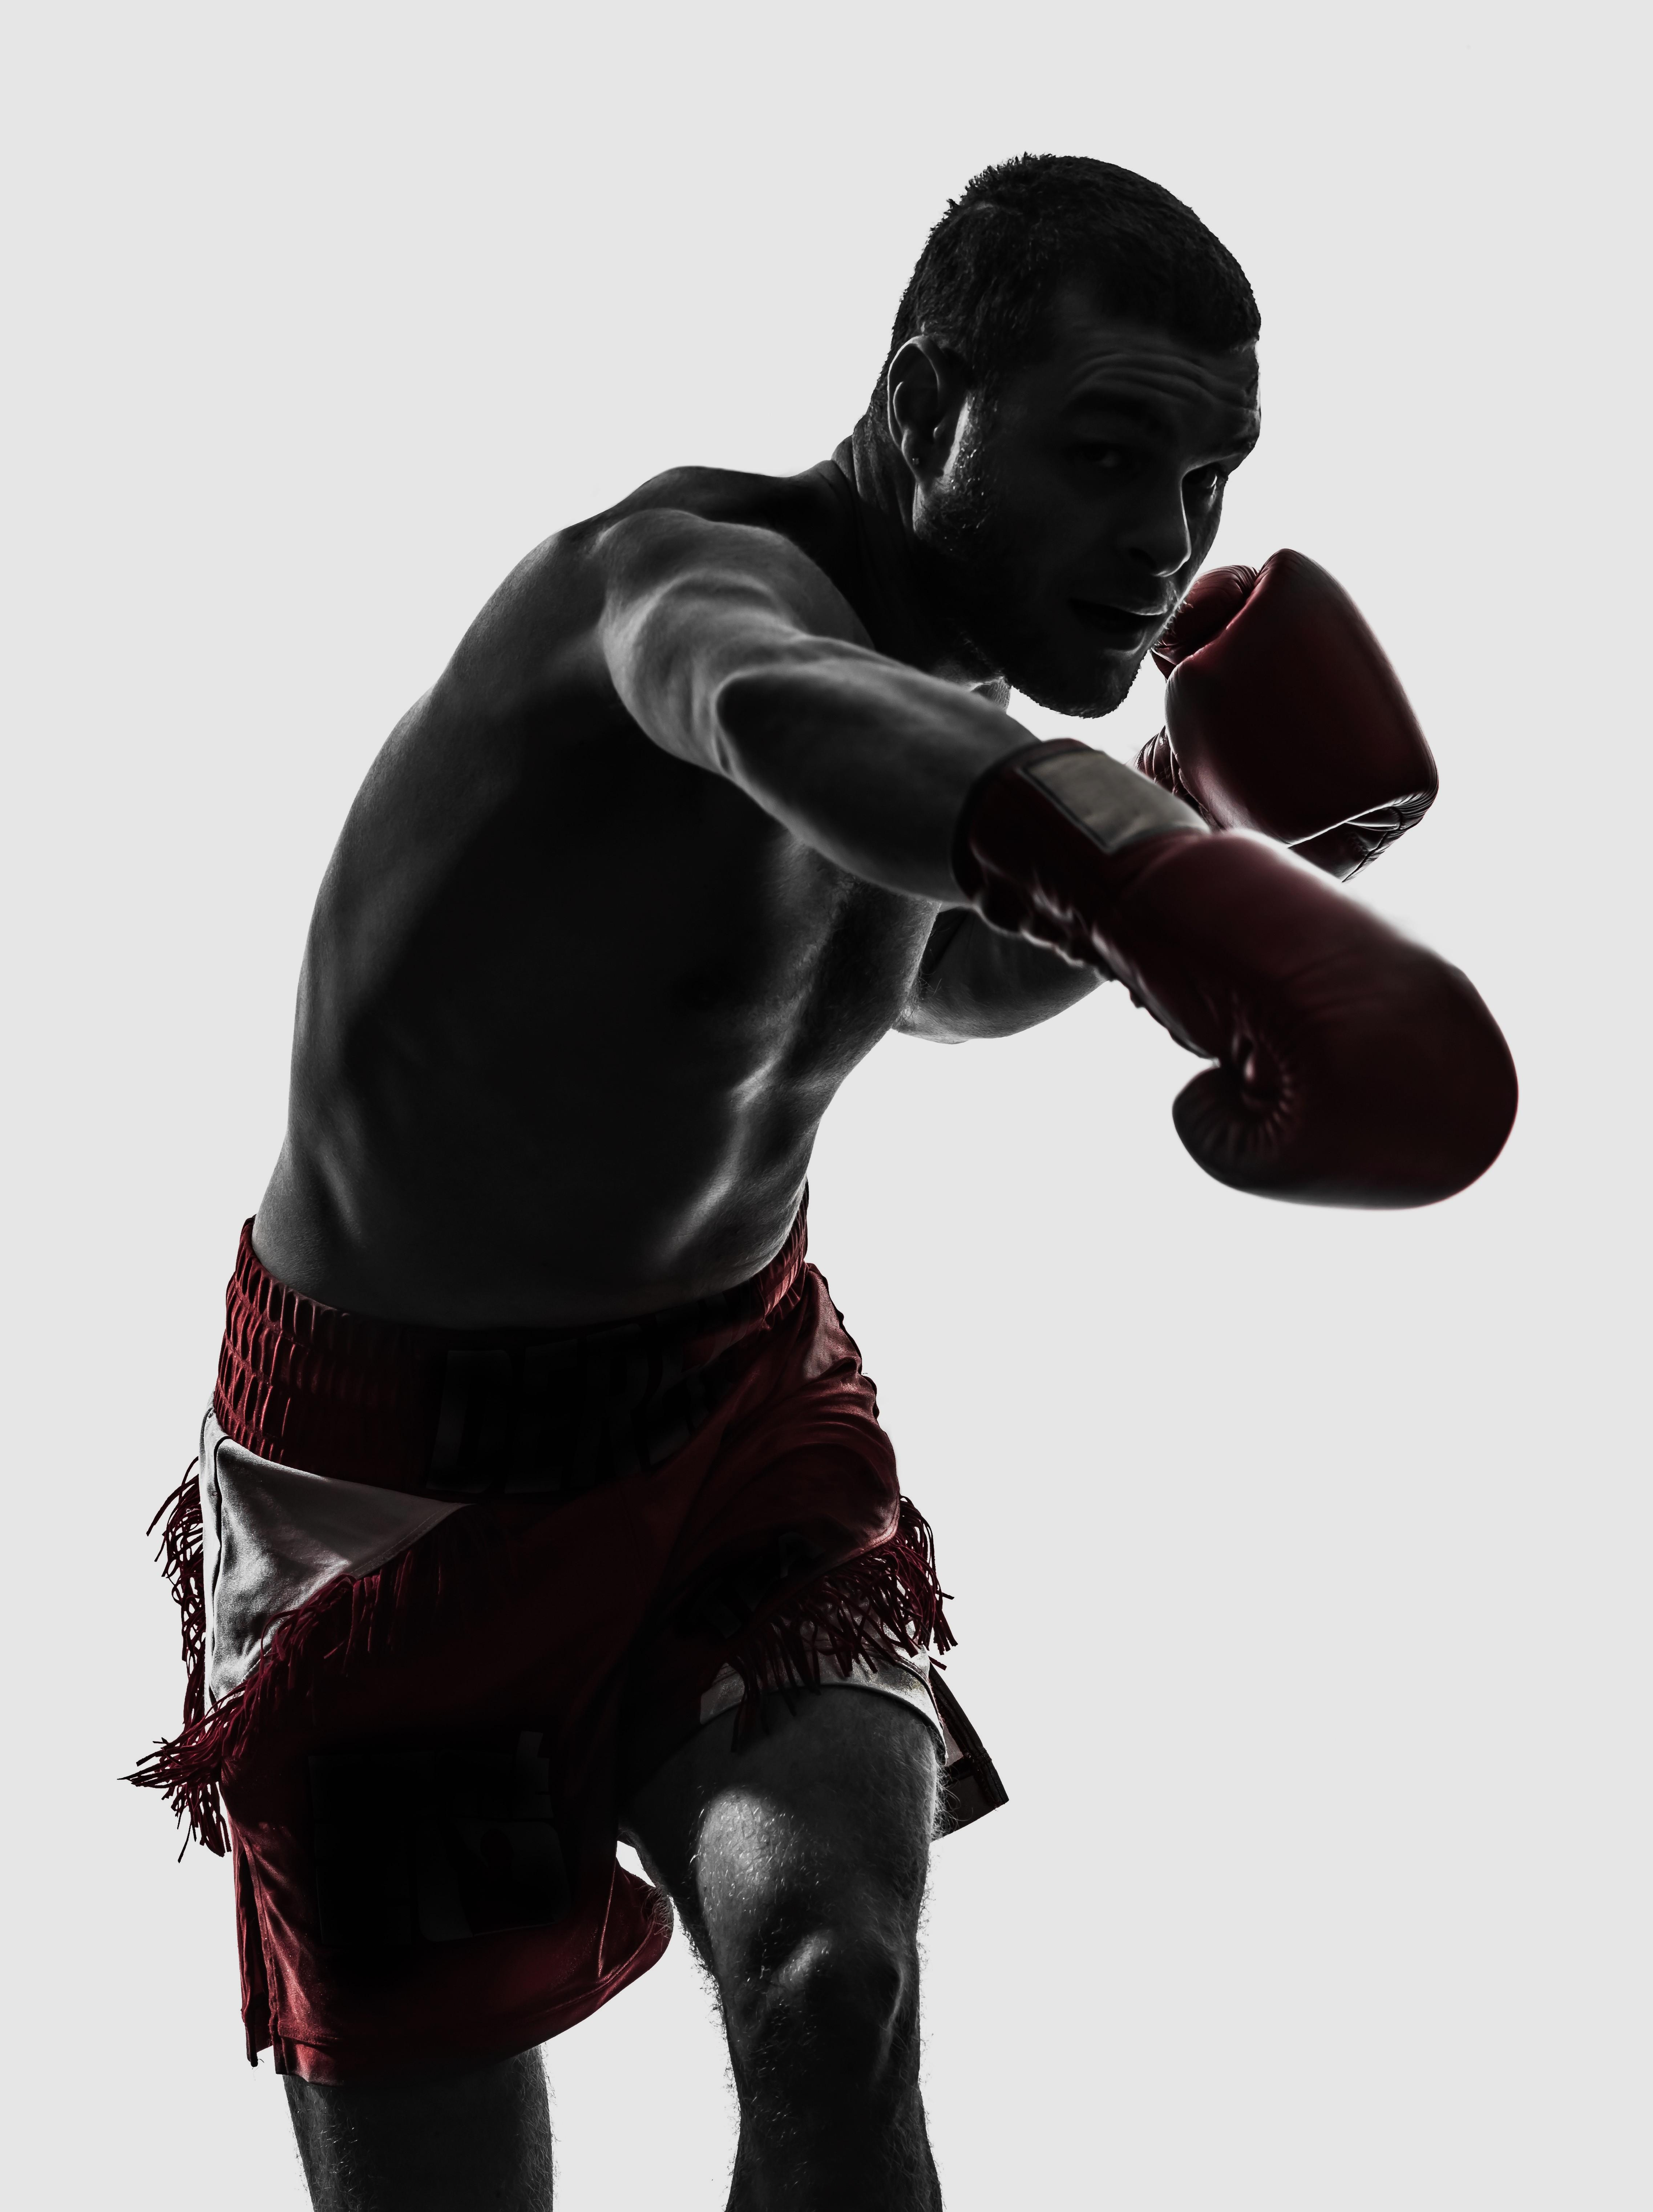 Kickboxing Wallpaper HD Download